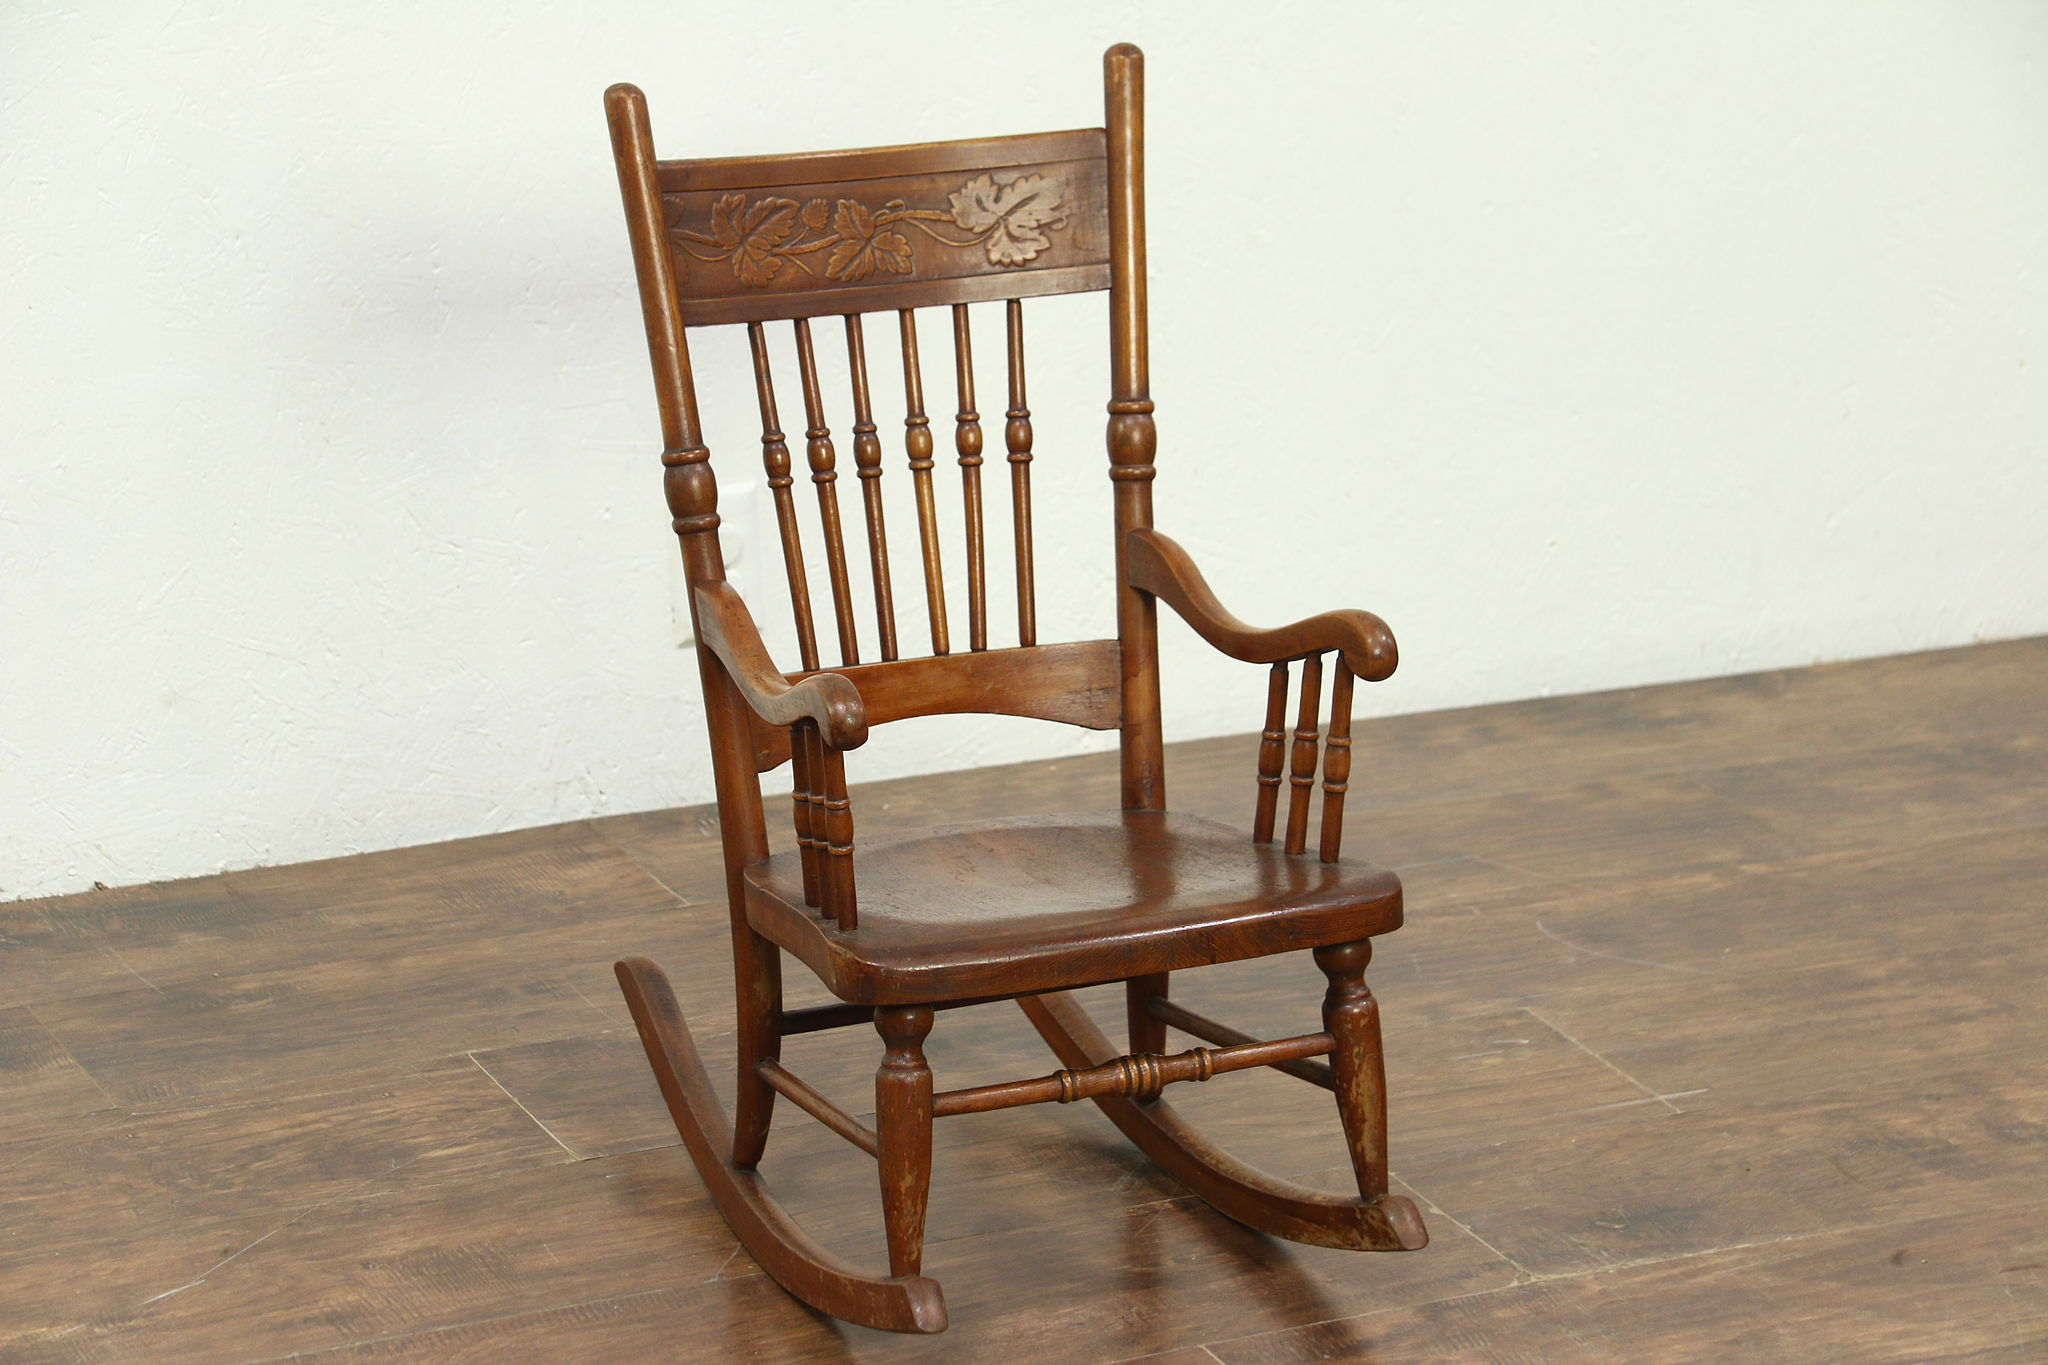 Tremendous Victorian Rocking Chair Press Carved Antique Child Size Rocker Creativecarmelina Interior Chair Design Creativecarmelinacom